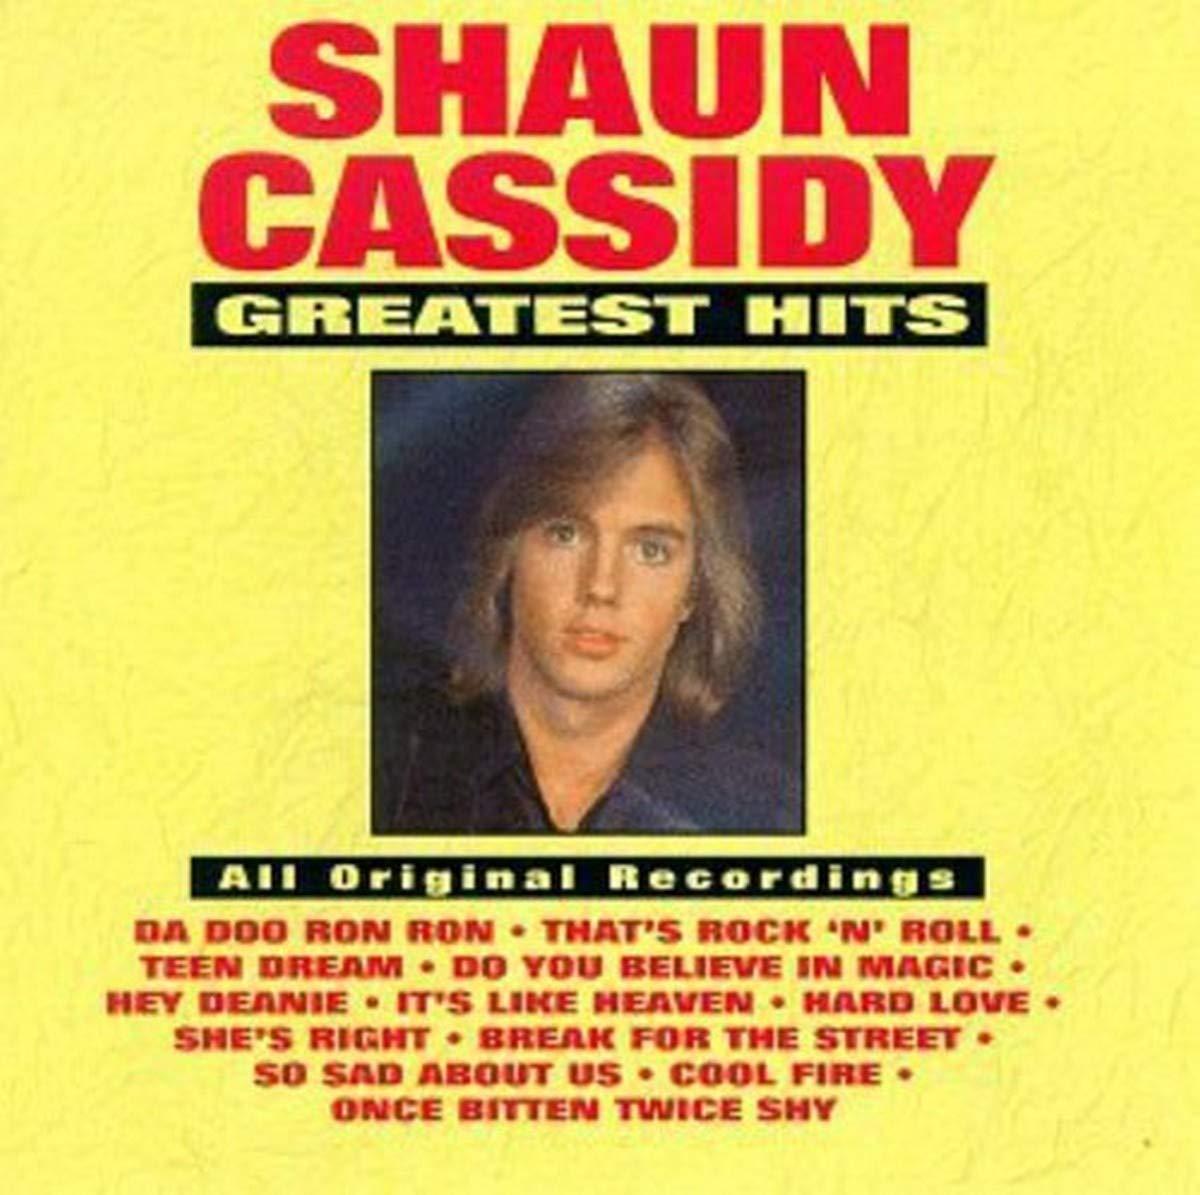 Greatest Hits: Shaun Cassidy: Amazon.es: Música